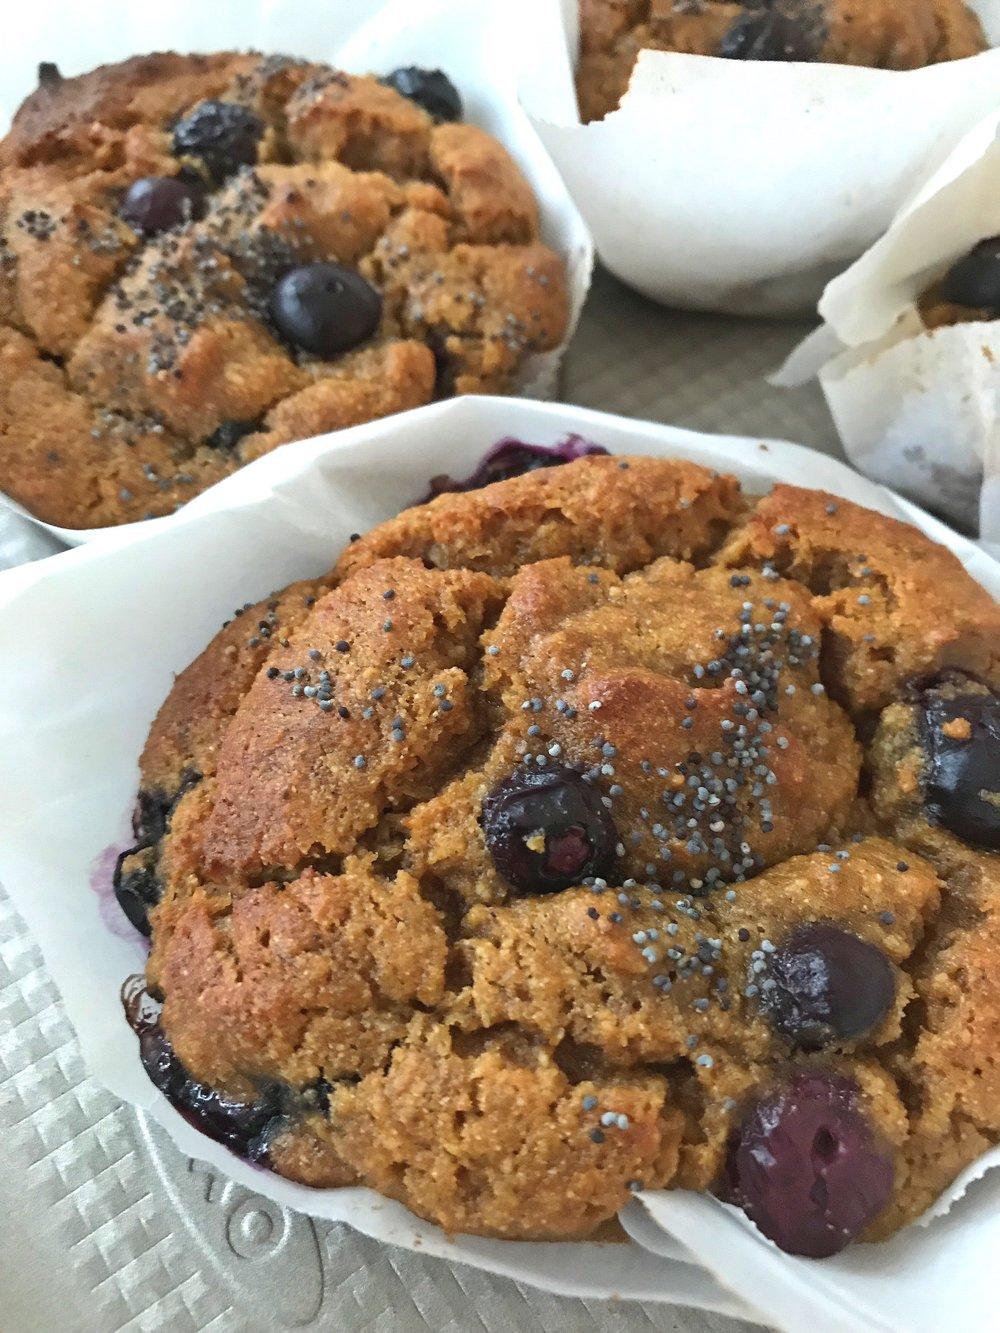 Muffins made with fresh organic blueberries. Photo credit @thomsgarth